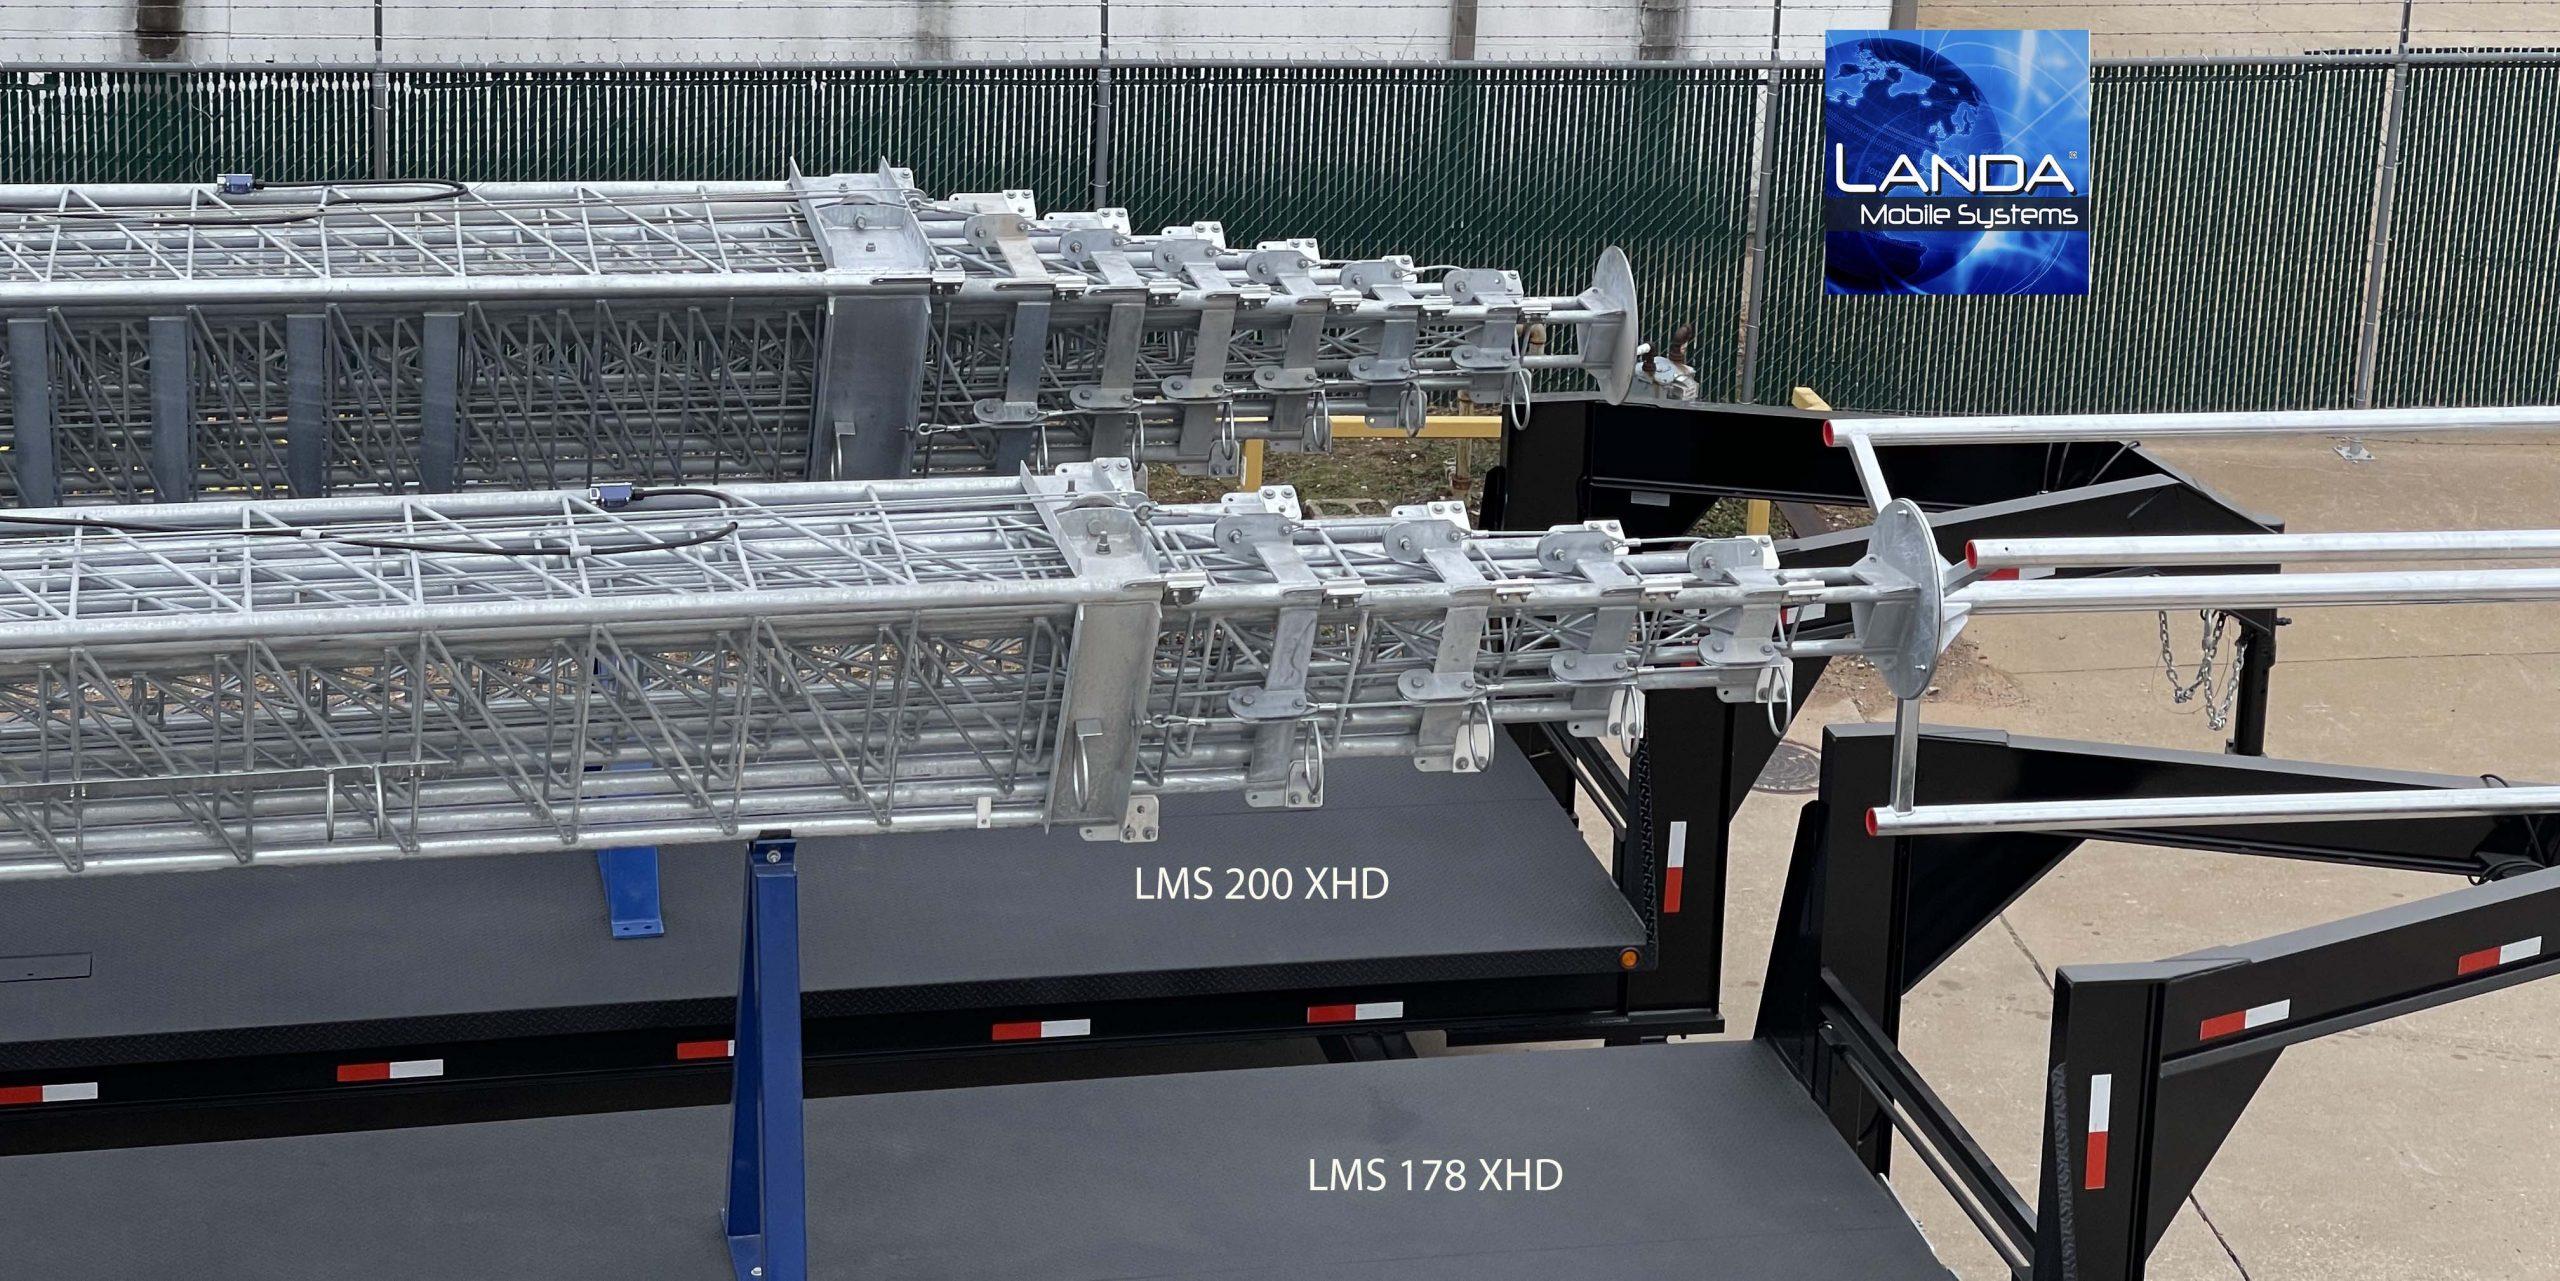 LMS 200 XHD NEXT TO 178 copy